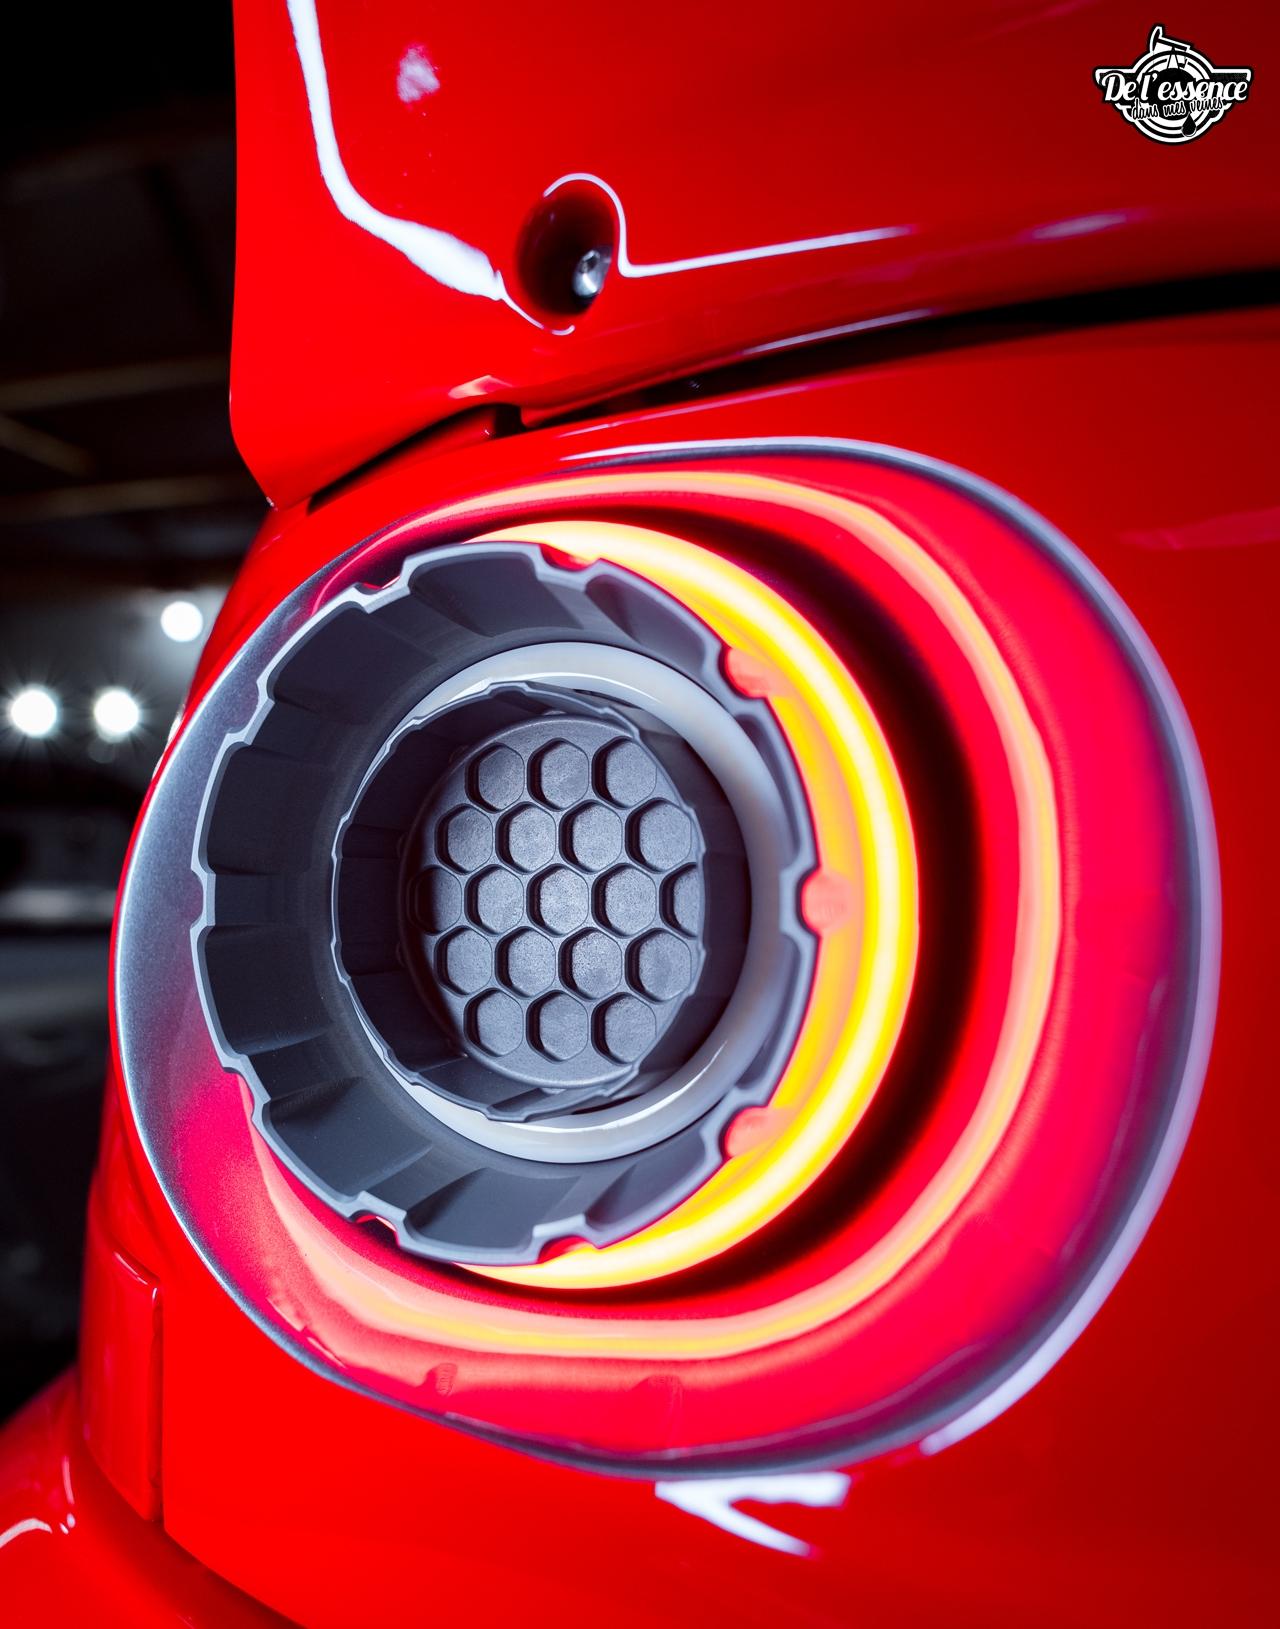 '94 Mazda Miata - Oh My God ! 9